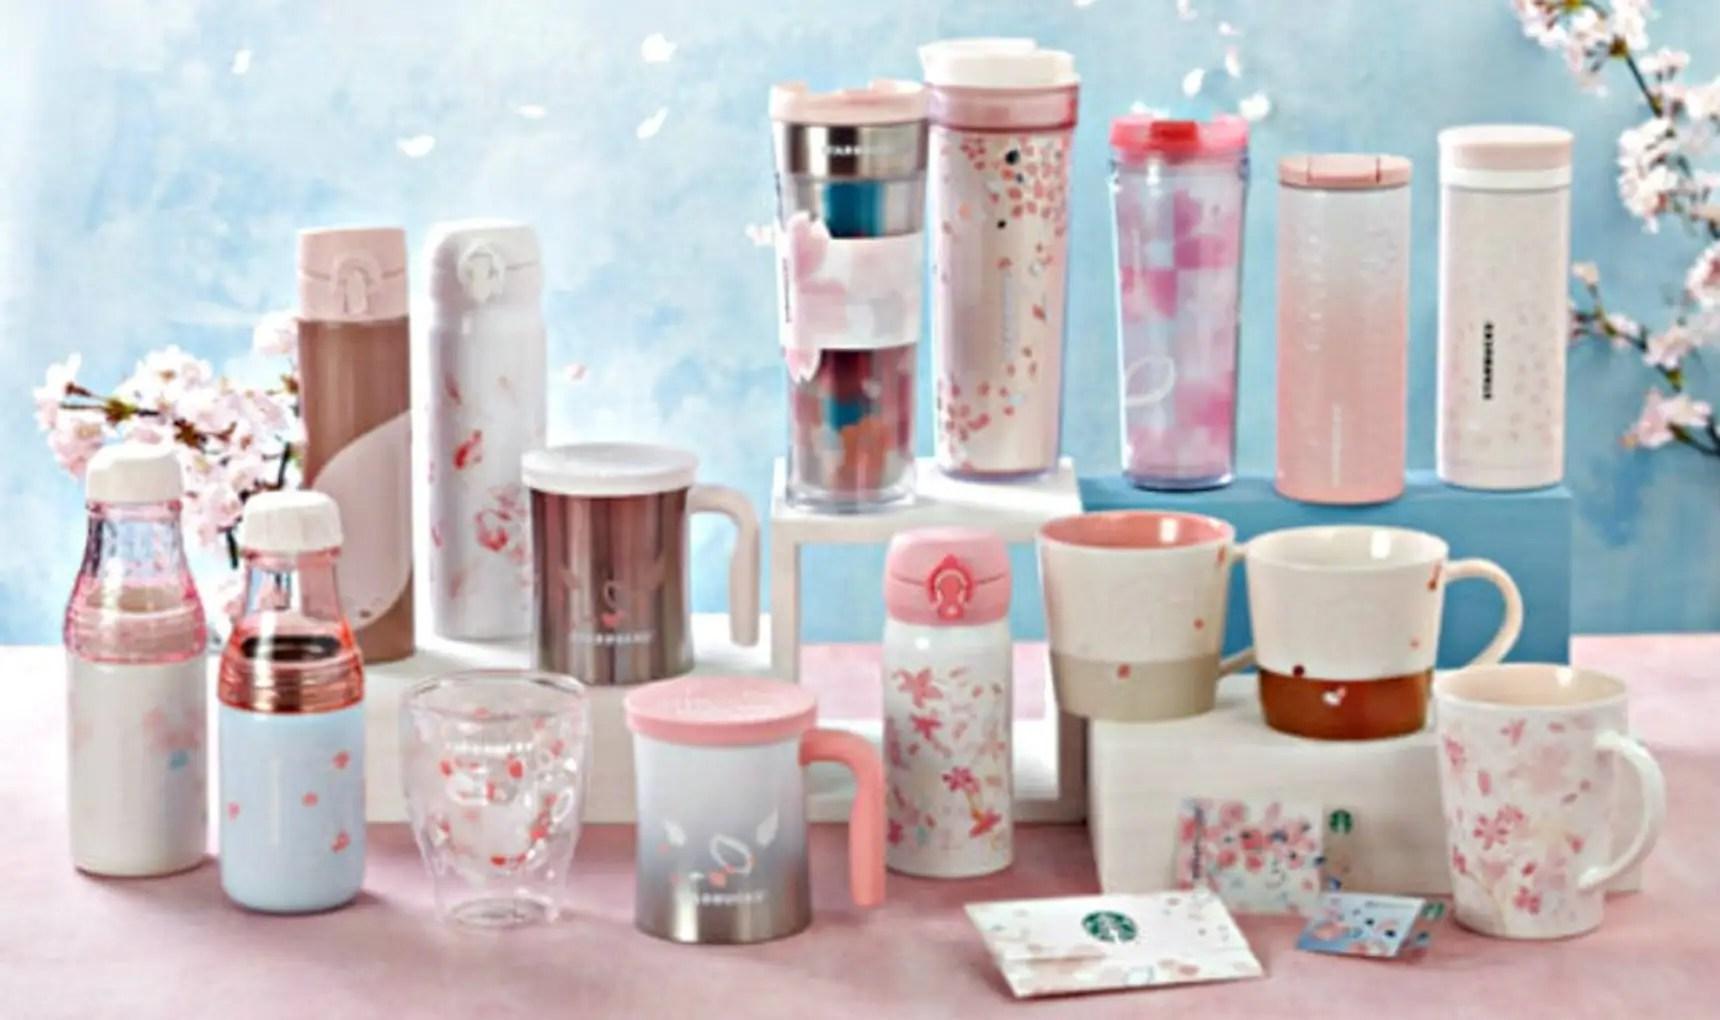 Sakura Themed Drinks Amp Merchandise Galore All About Japan